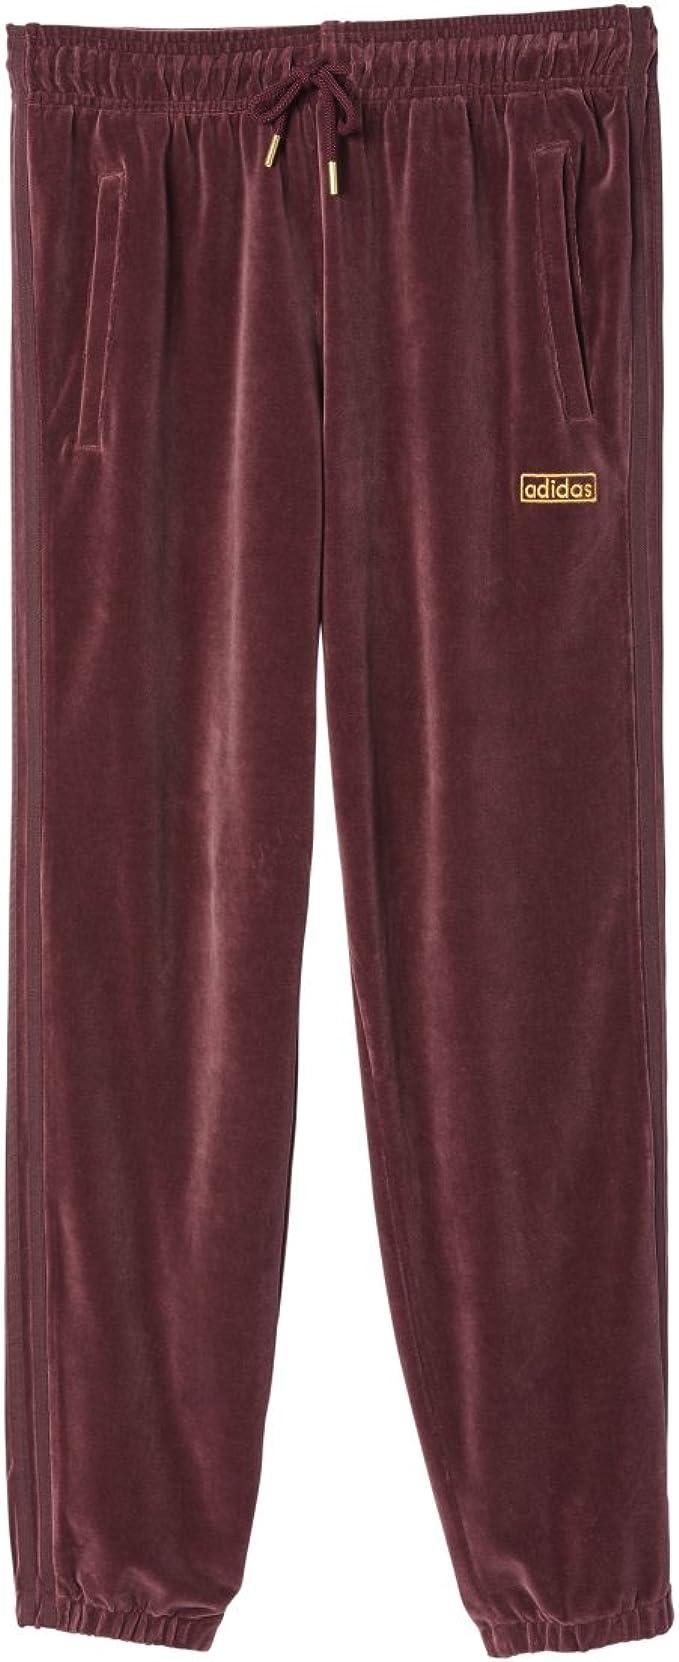 adidas Originals – Pantalón de chándal para Hombre Granate ay9231 ...